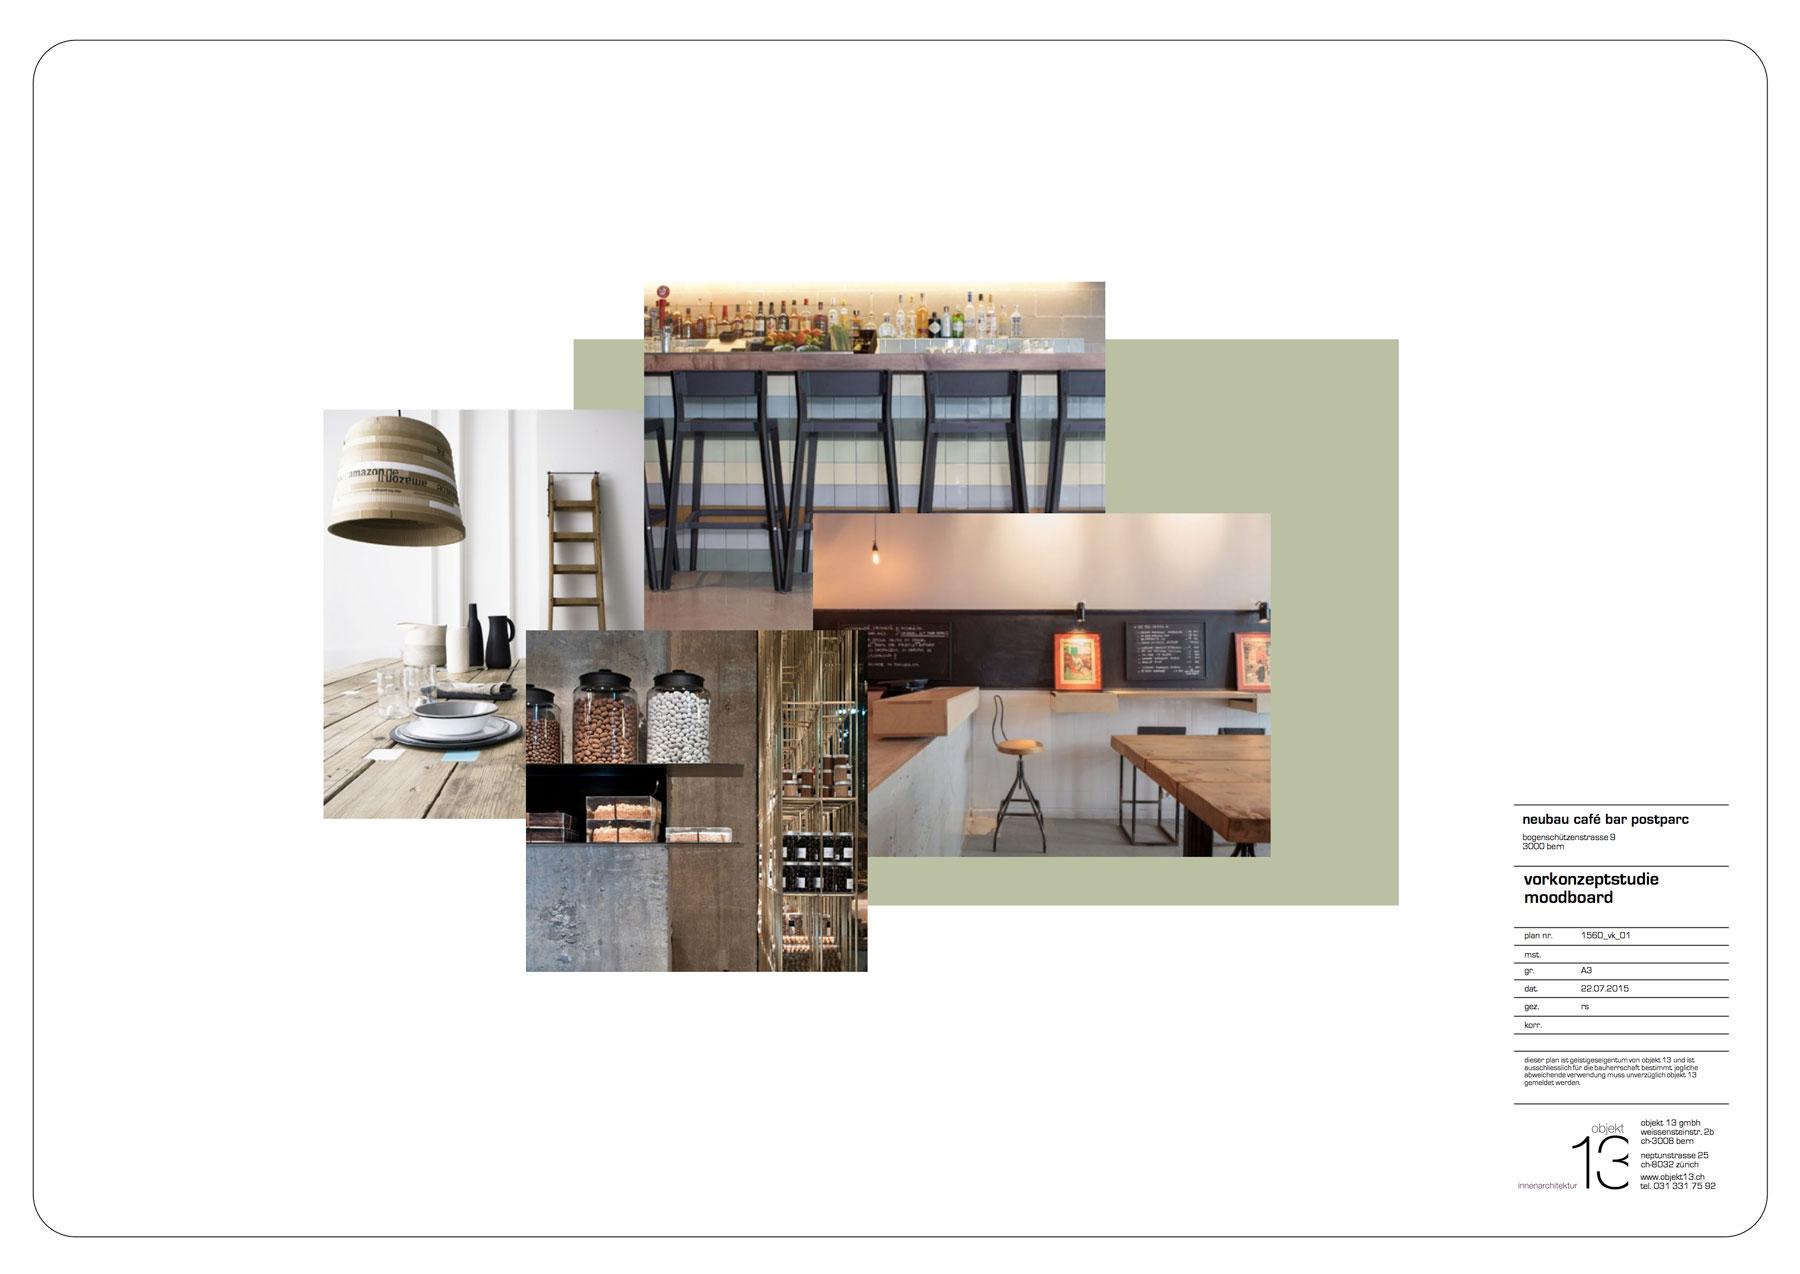 café-bar-bern-zürich-innenarchitektur-objekt-13-